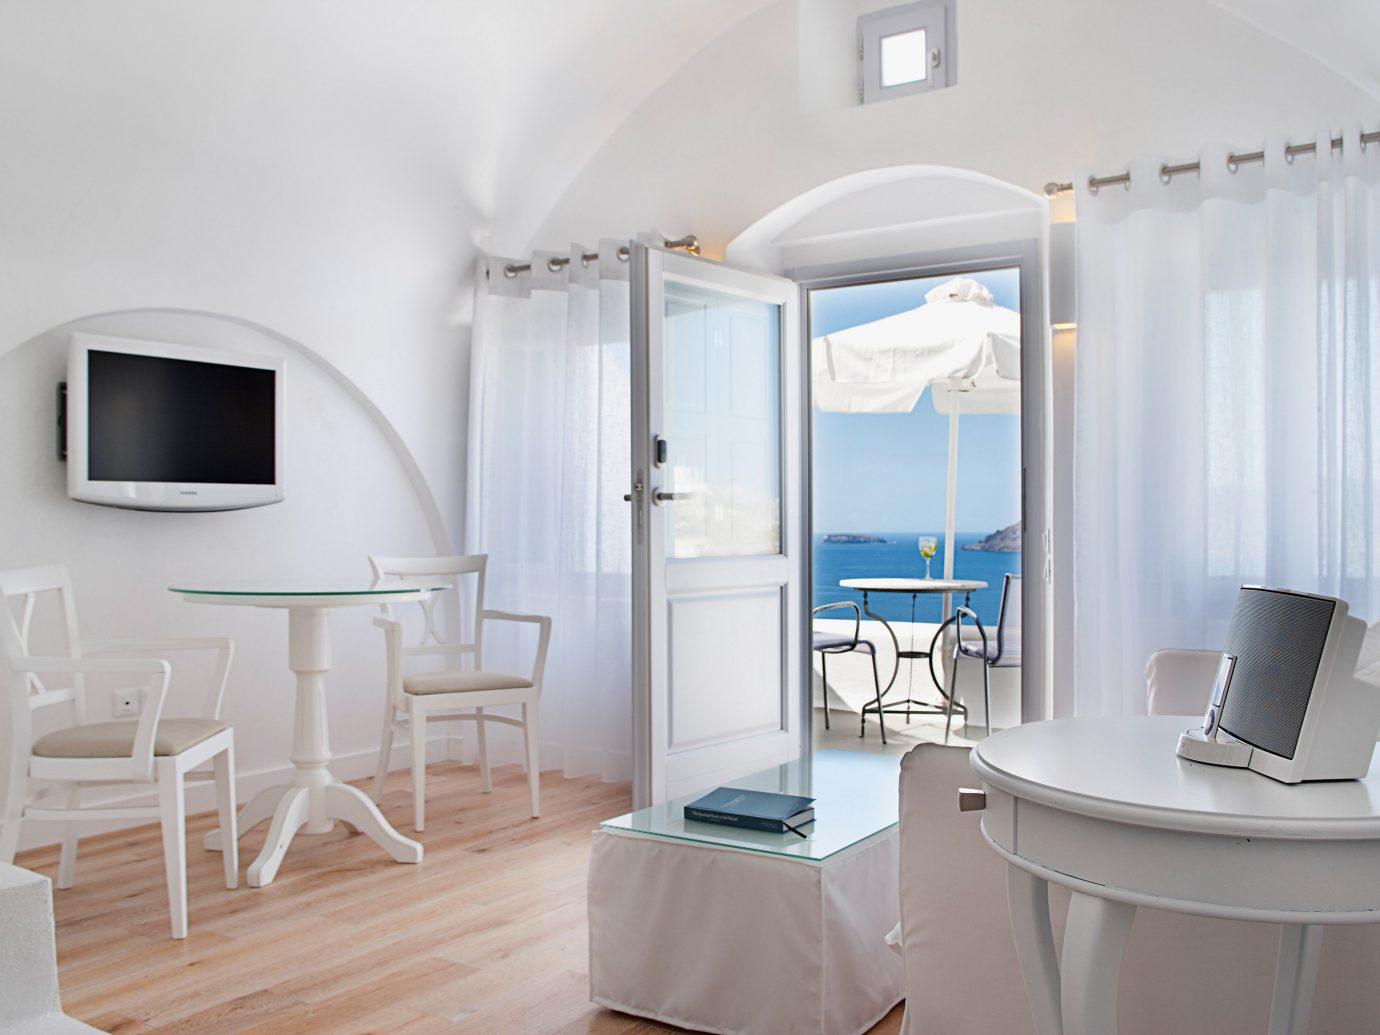 Beach Elegant Greece Hip Hotels Islands Living Lounge Luxury Luxury Travel Patio Santorini Trip Ideas indoor wall floor room property interior design ceiling real estate Design Suite cottage apartment furniture